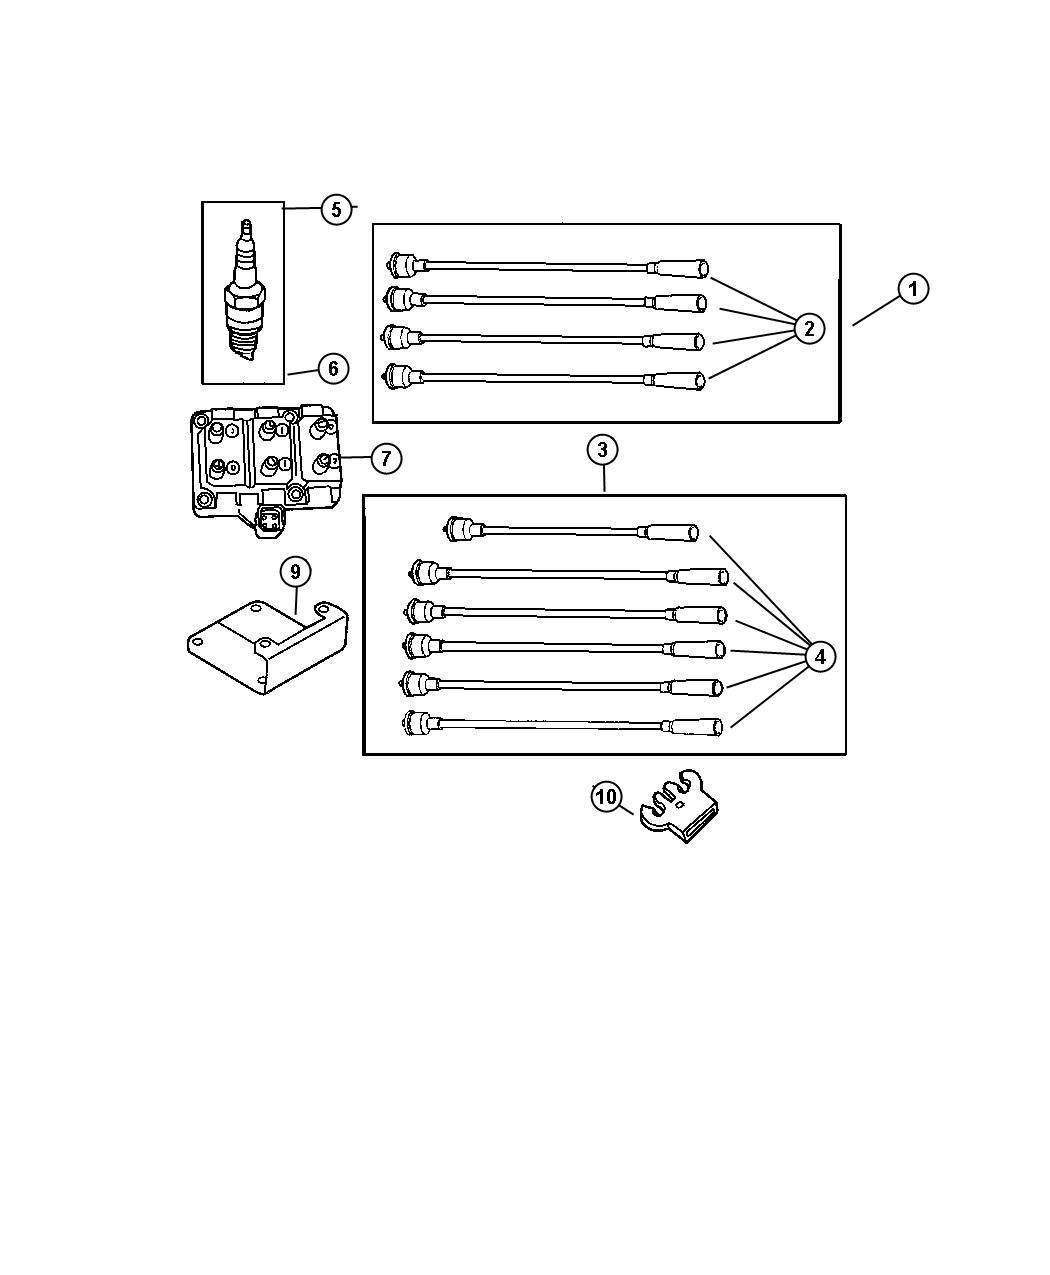 Dodge Ram 1500 Spark plug. Re16mc. Plugscablescoil, wires